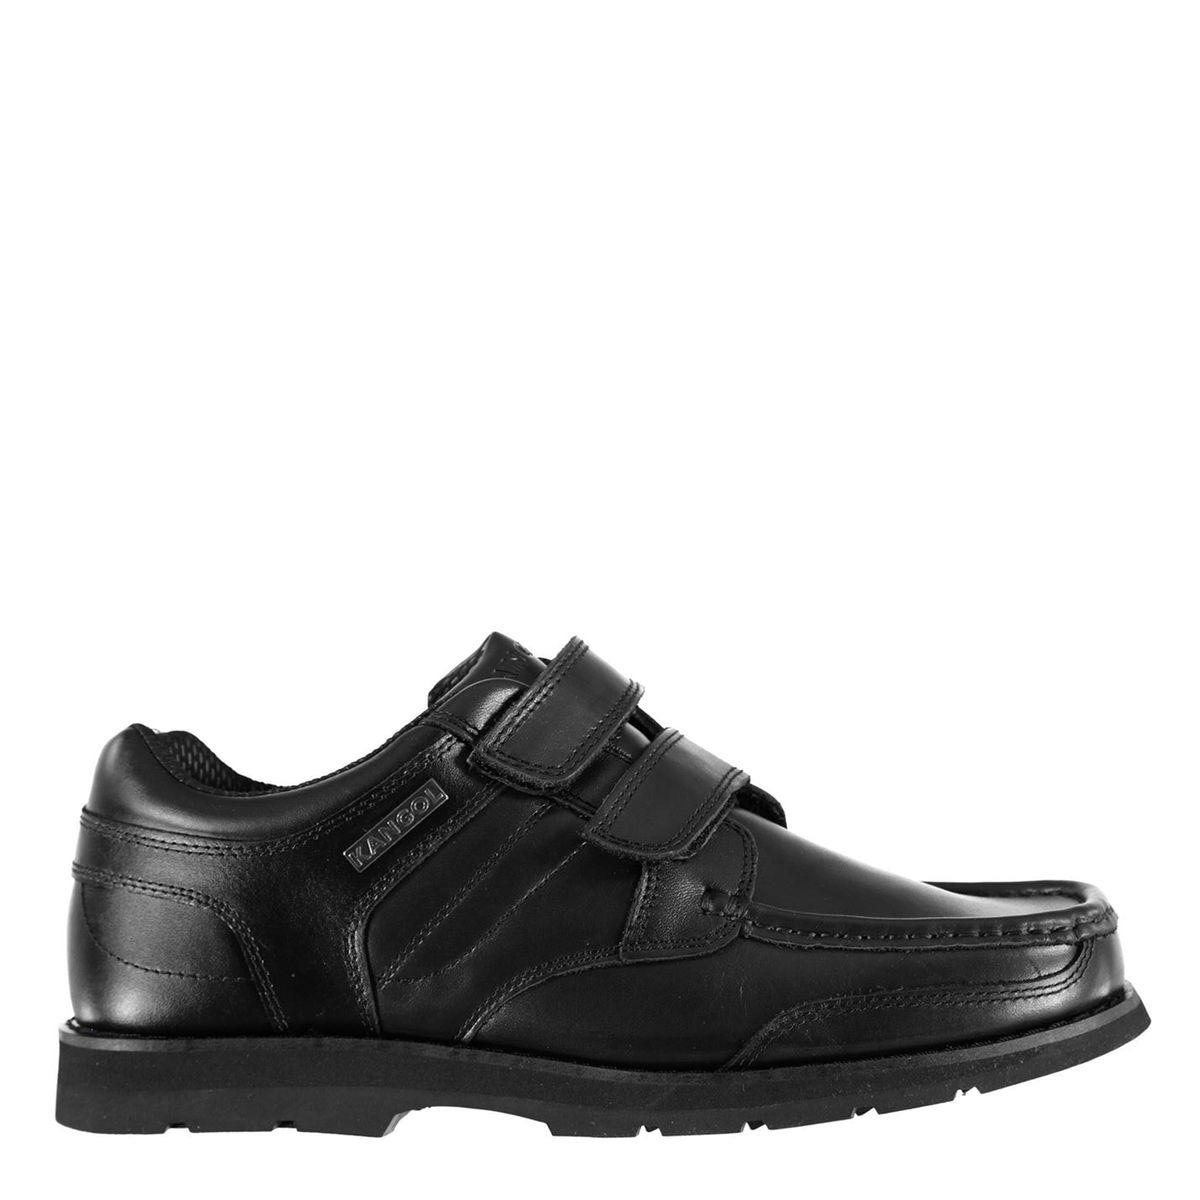 Chaussures mocassins habillés bande velcro